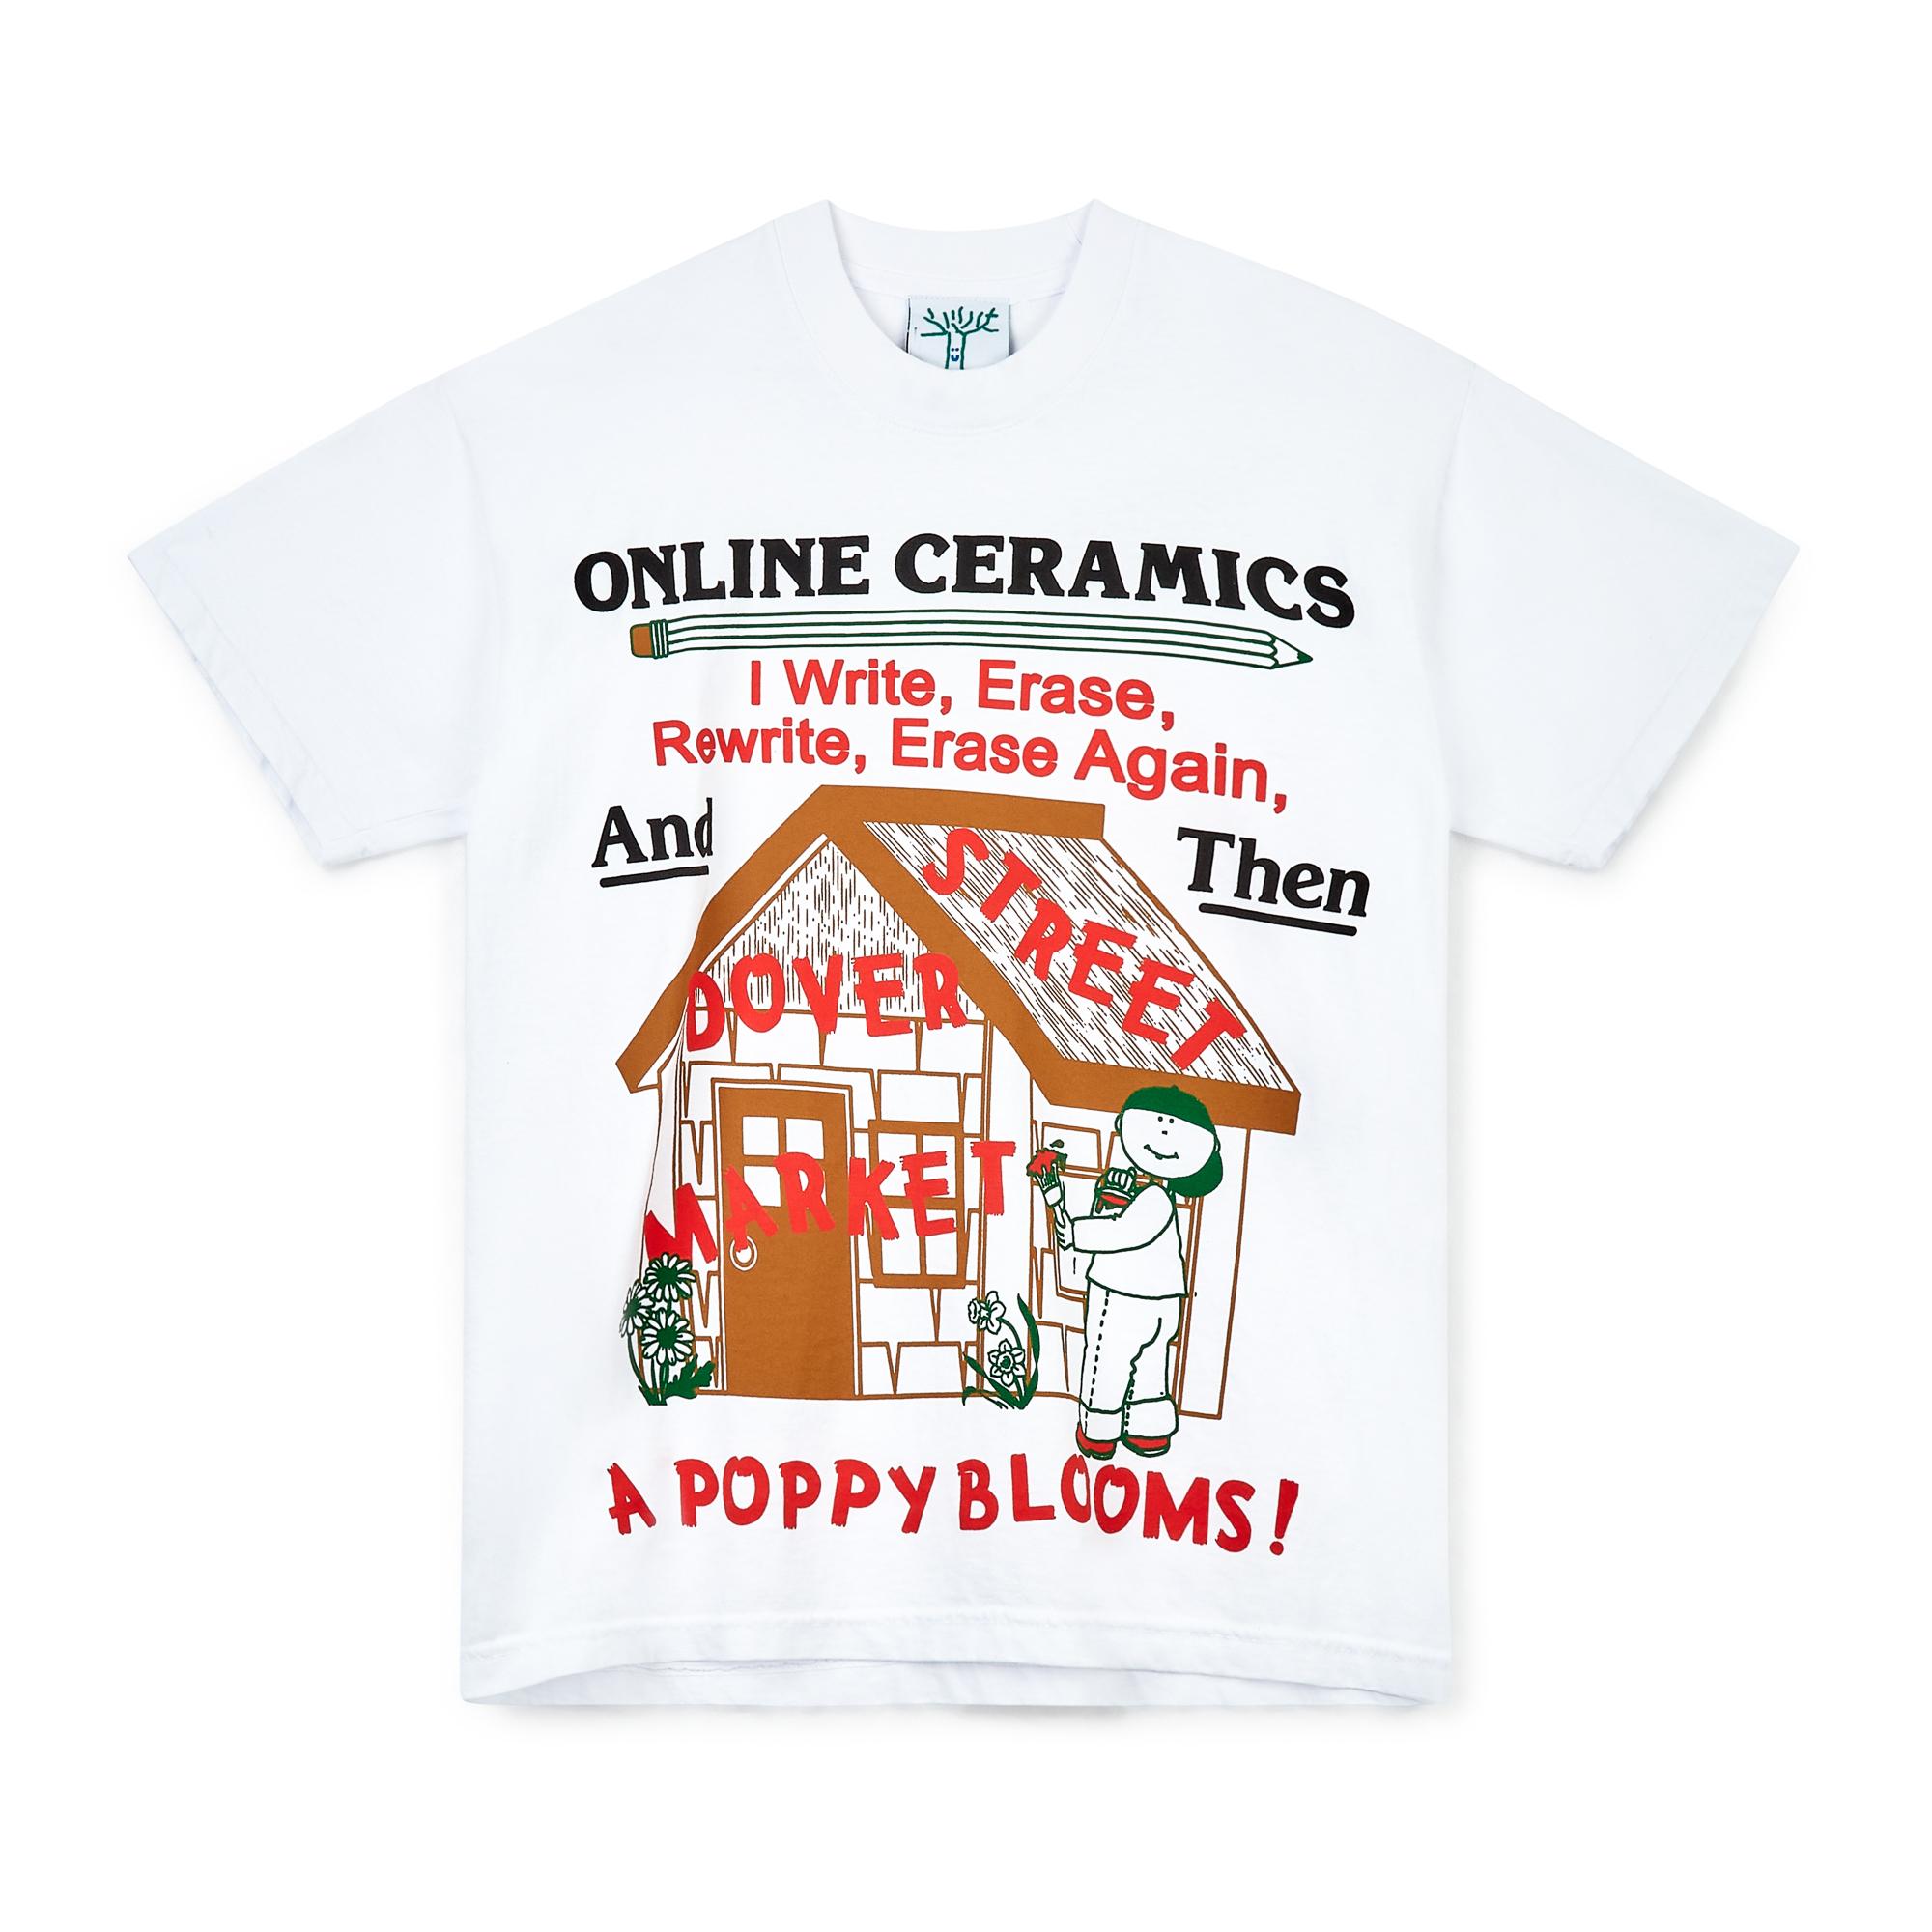 Online Ceramics - shot 16